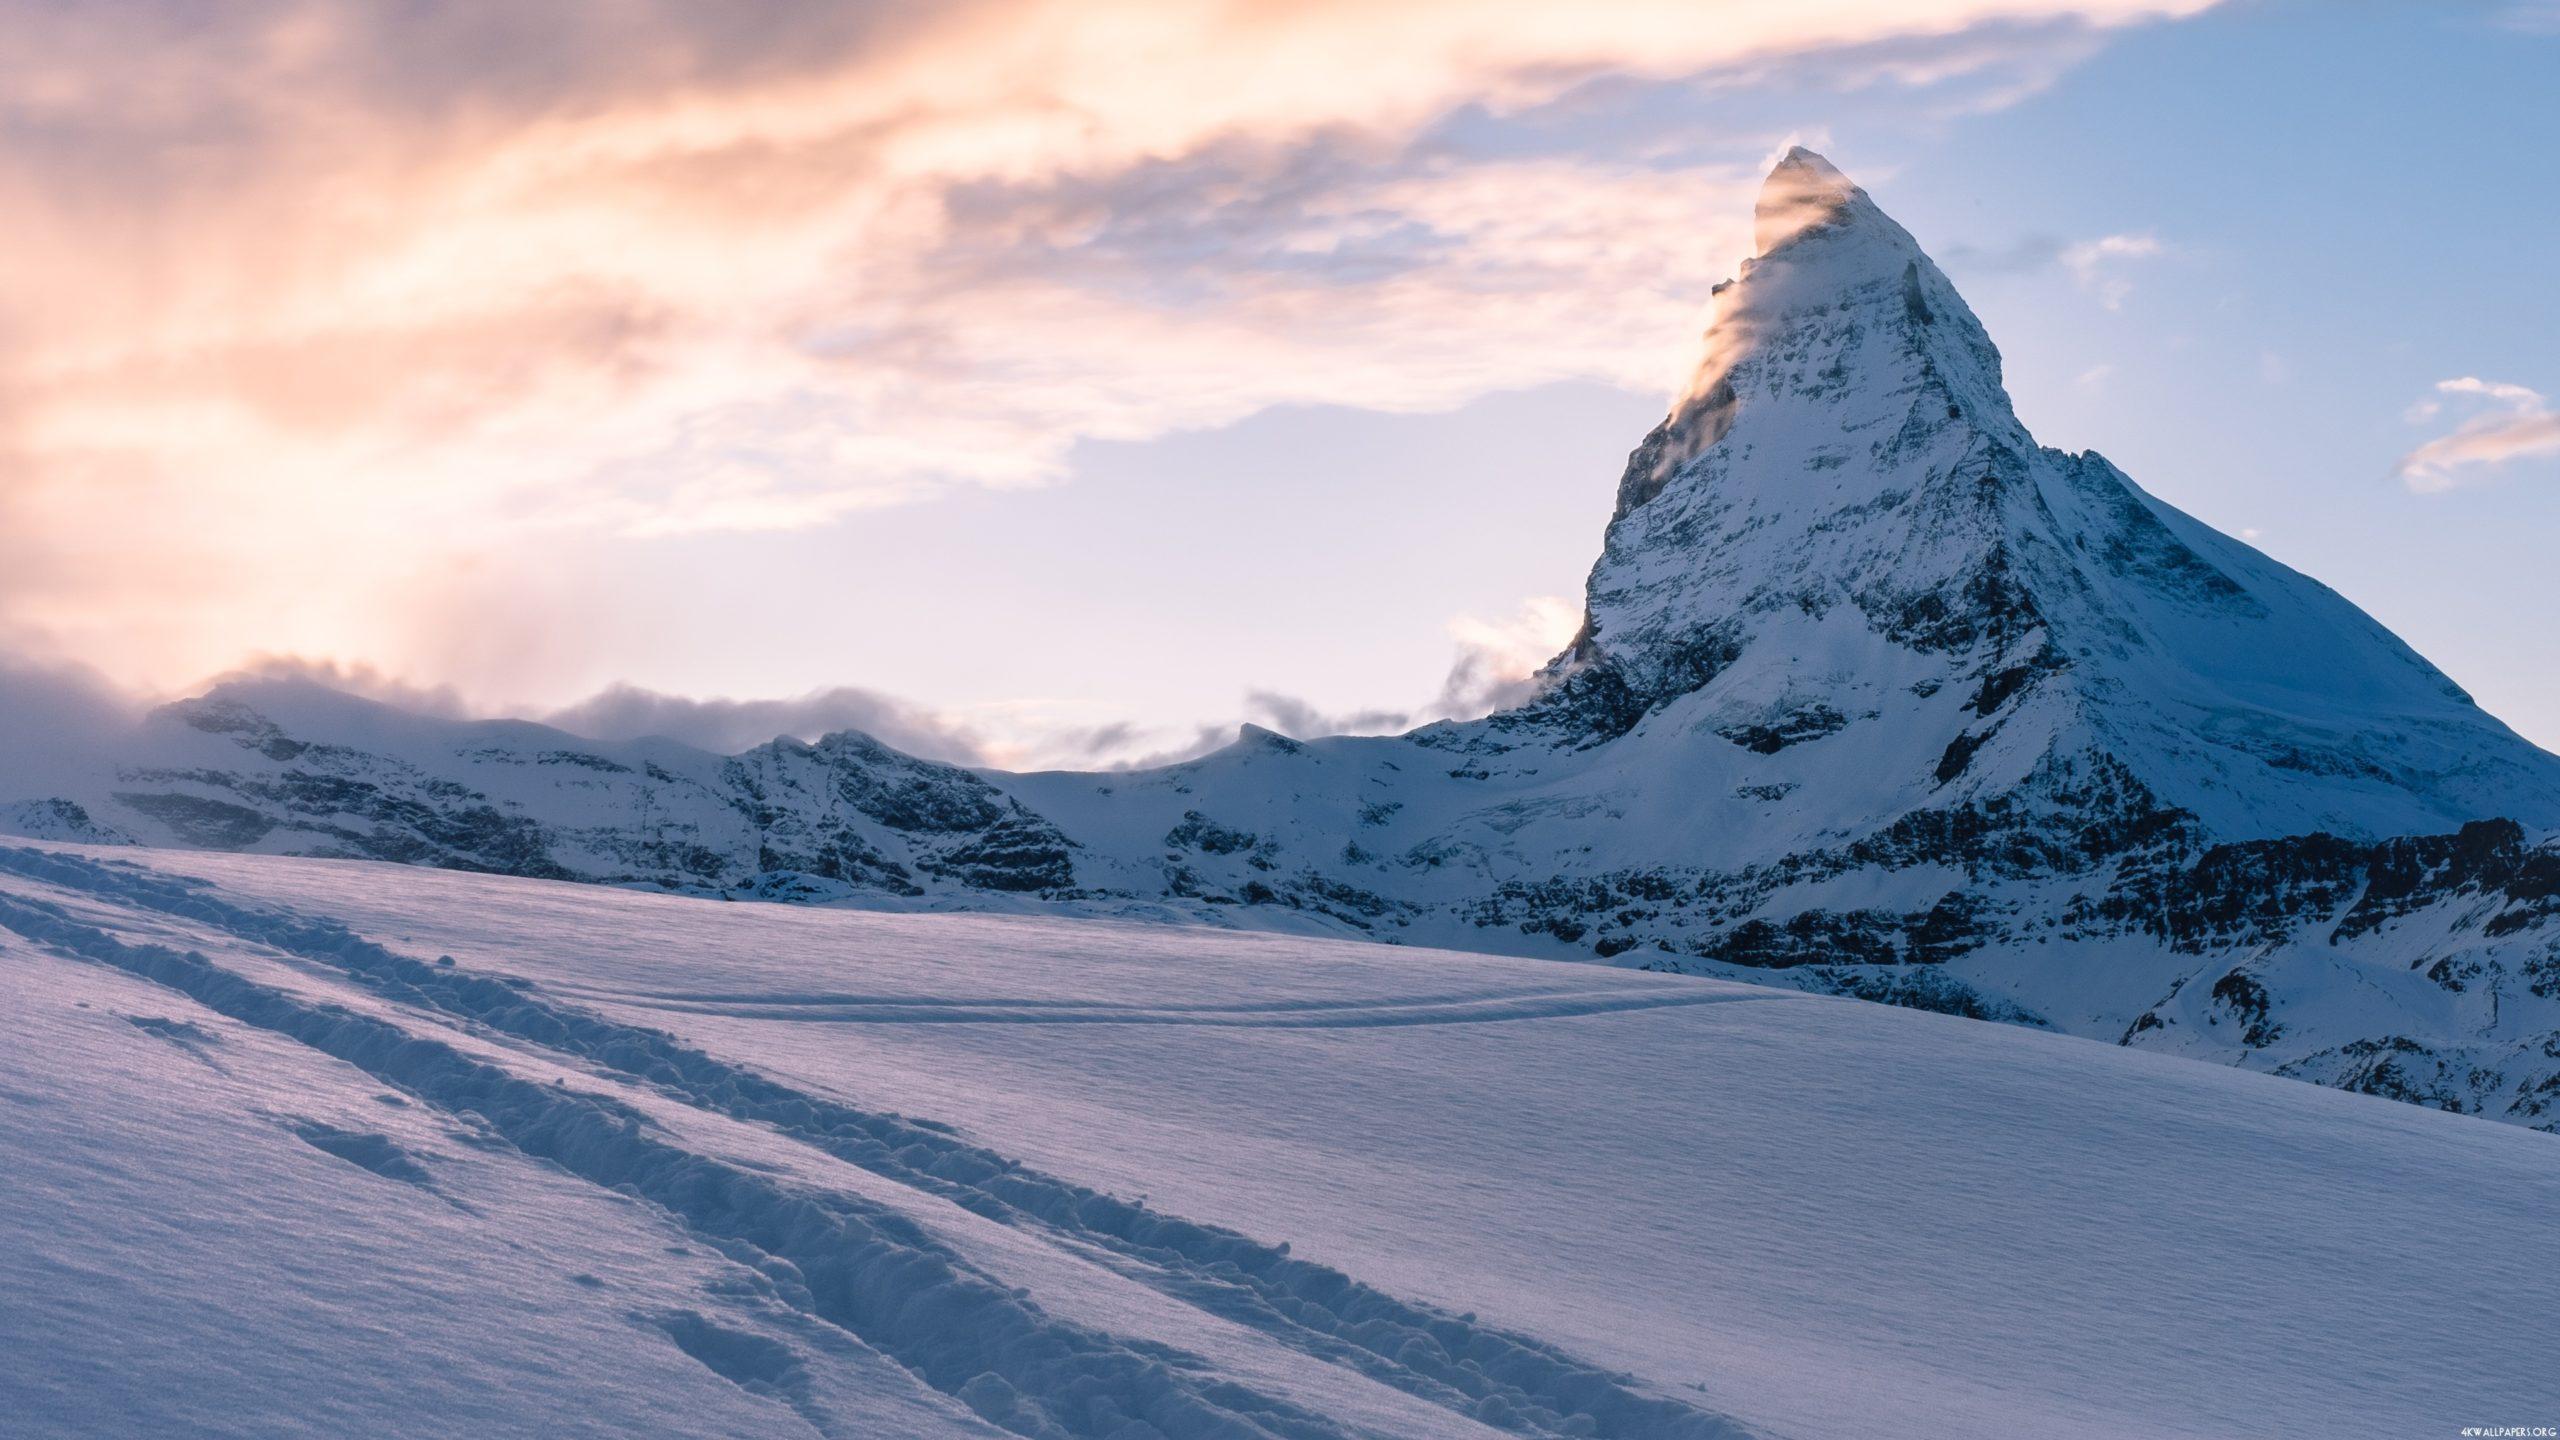 hd mountain wallpapers 1080p